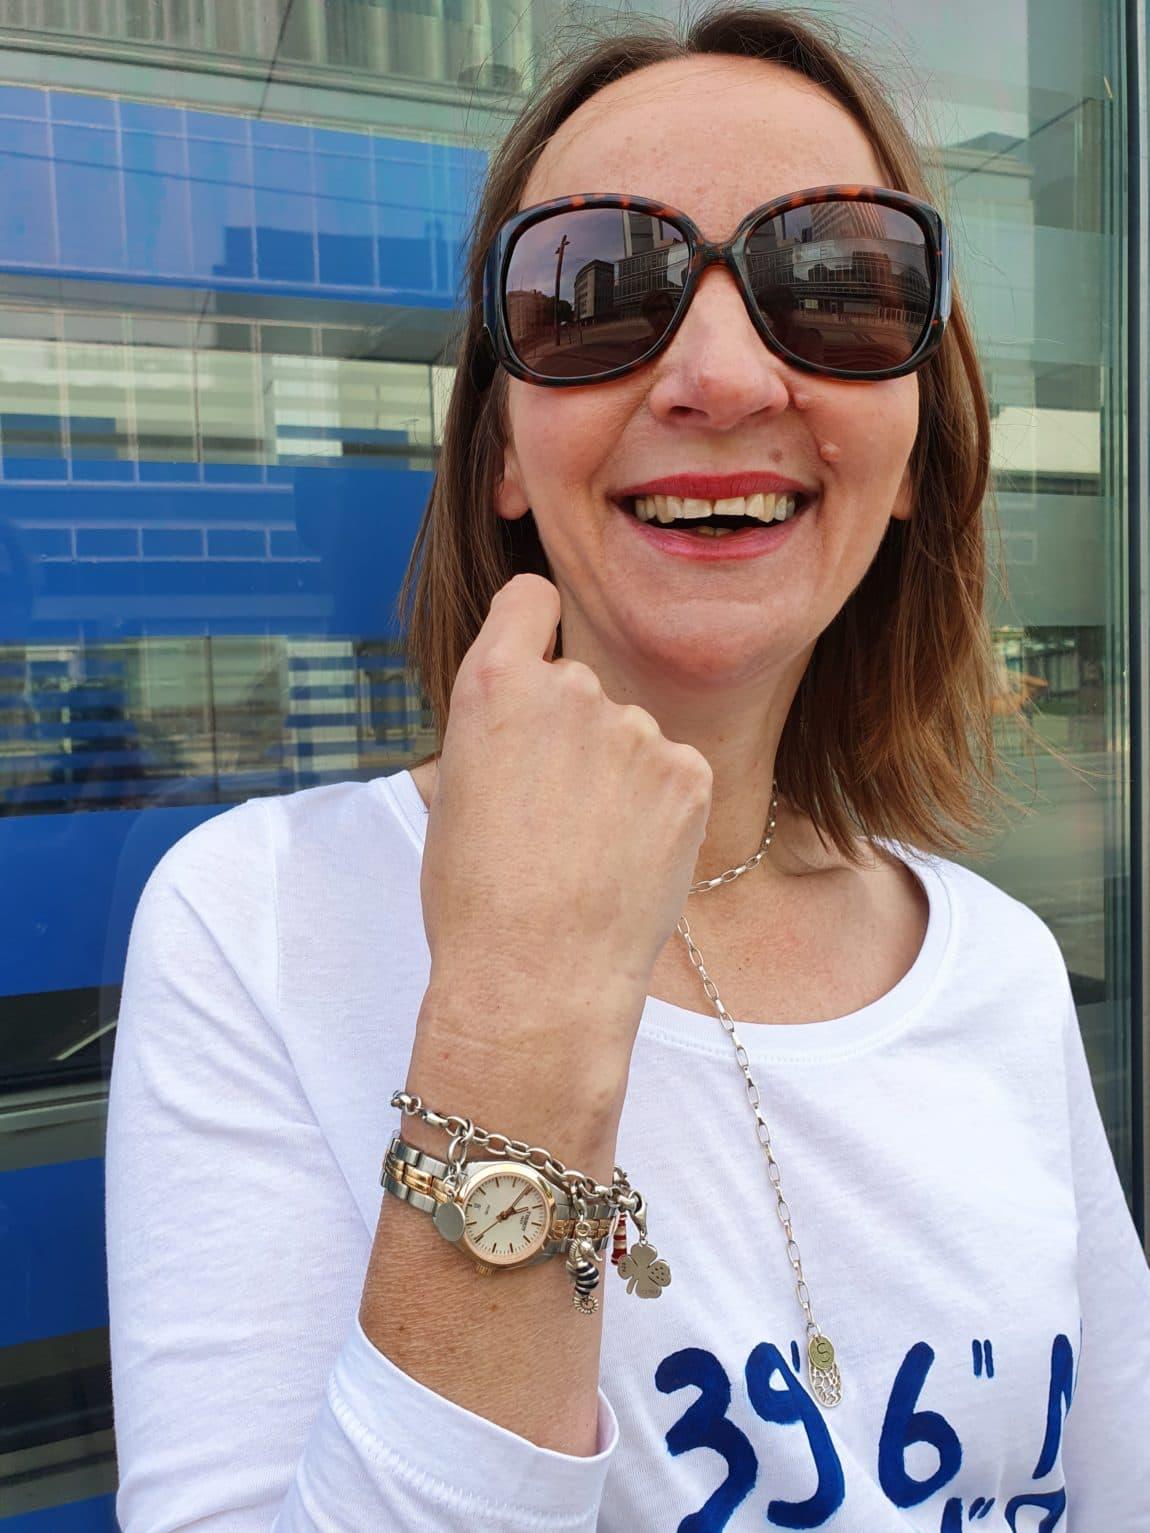 Damen-Uhren-online-kaufen_damen-edelstahlarmaband-tissot-uhrenzentrum-oceanblue-style.jpg